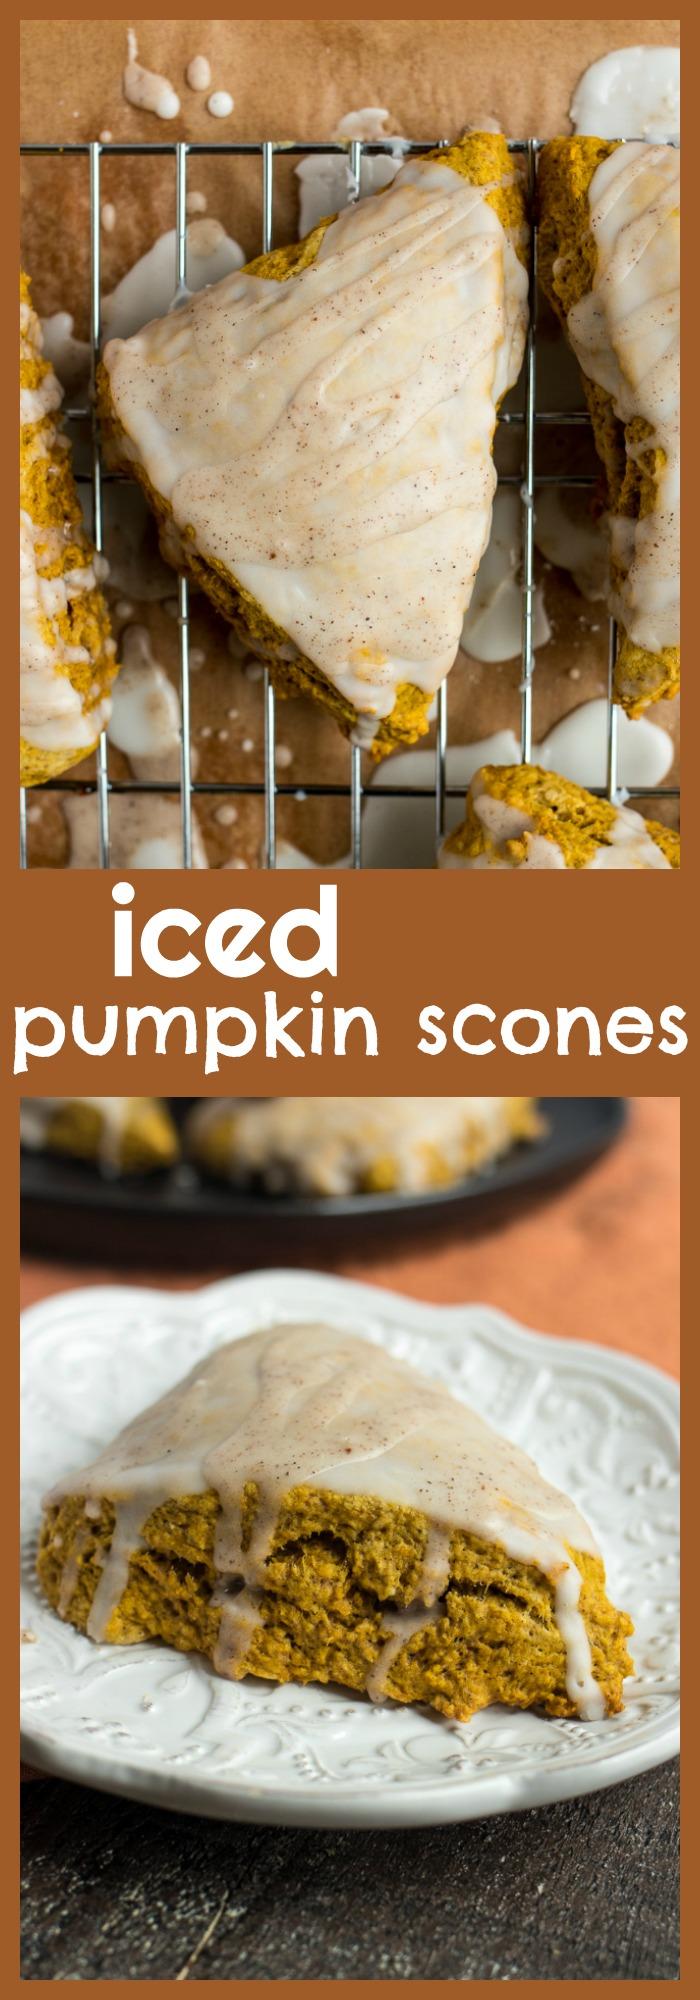 Iced Pumpkin Scones photo collage